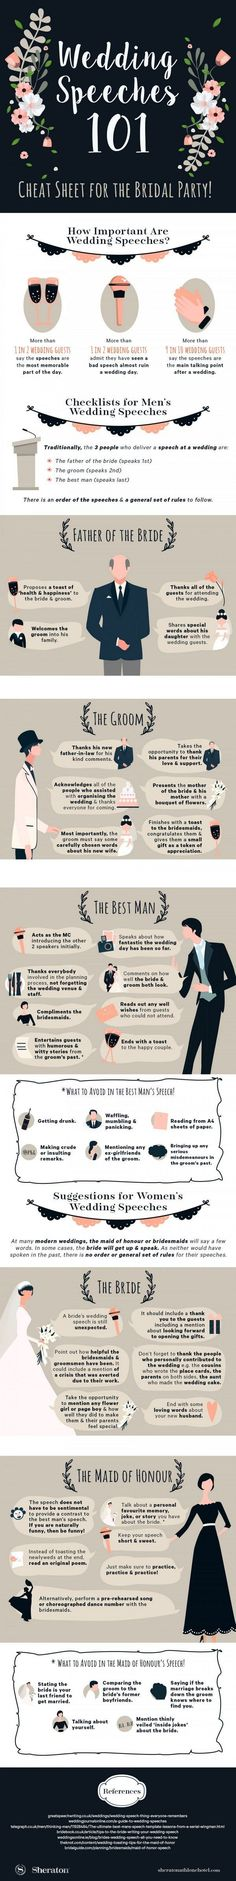 wedding speeches 101 infographic / http://www.deerpearlflowers.com/wedding-planning-infographics/5/ #weddingplanninginfographic